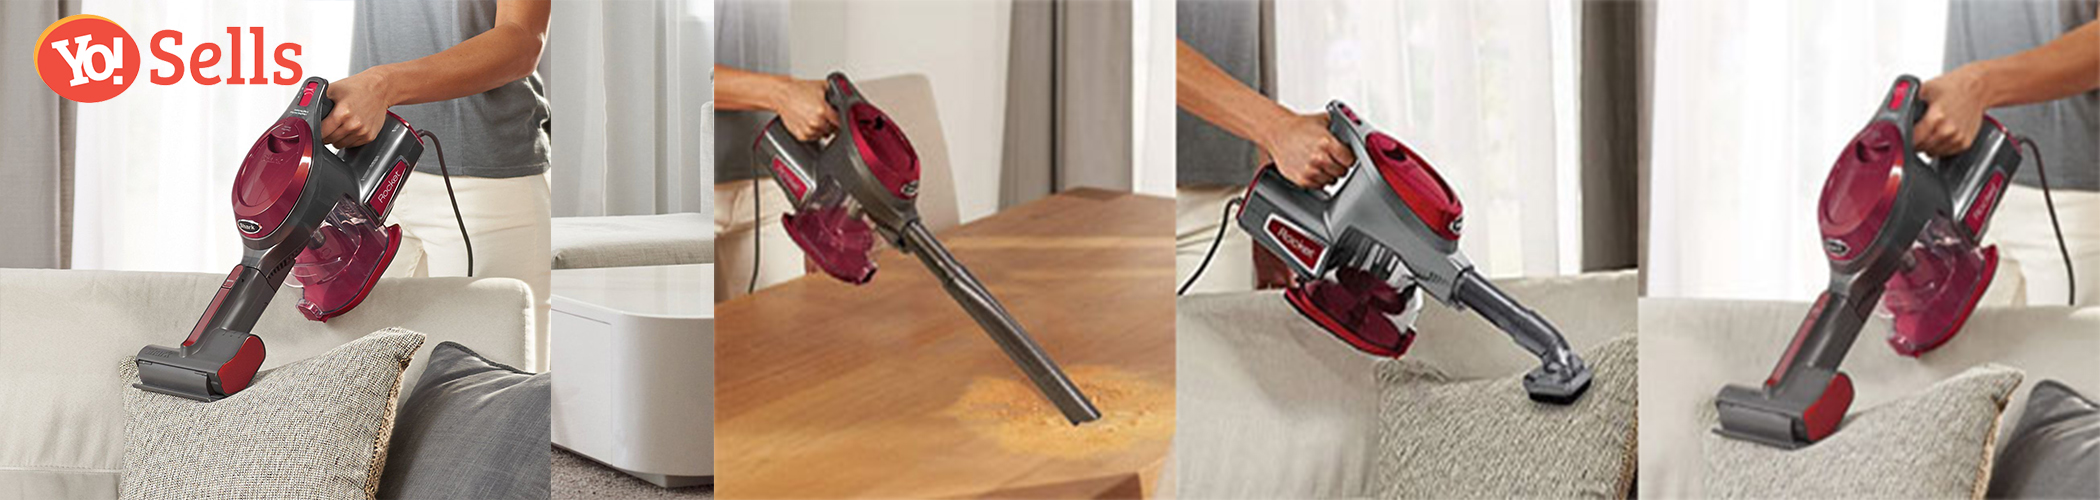 Shark Rocket Corded Hand Vac (HV292)